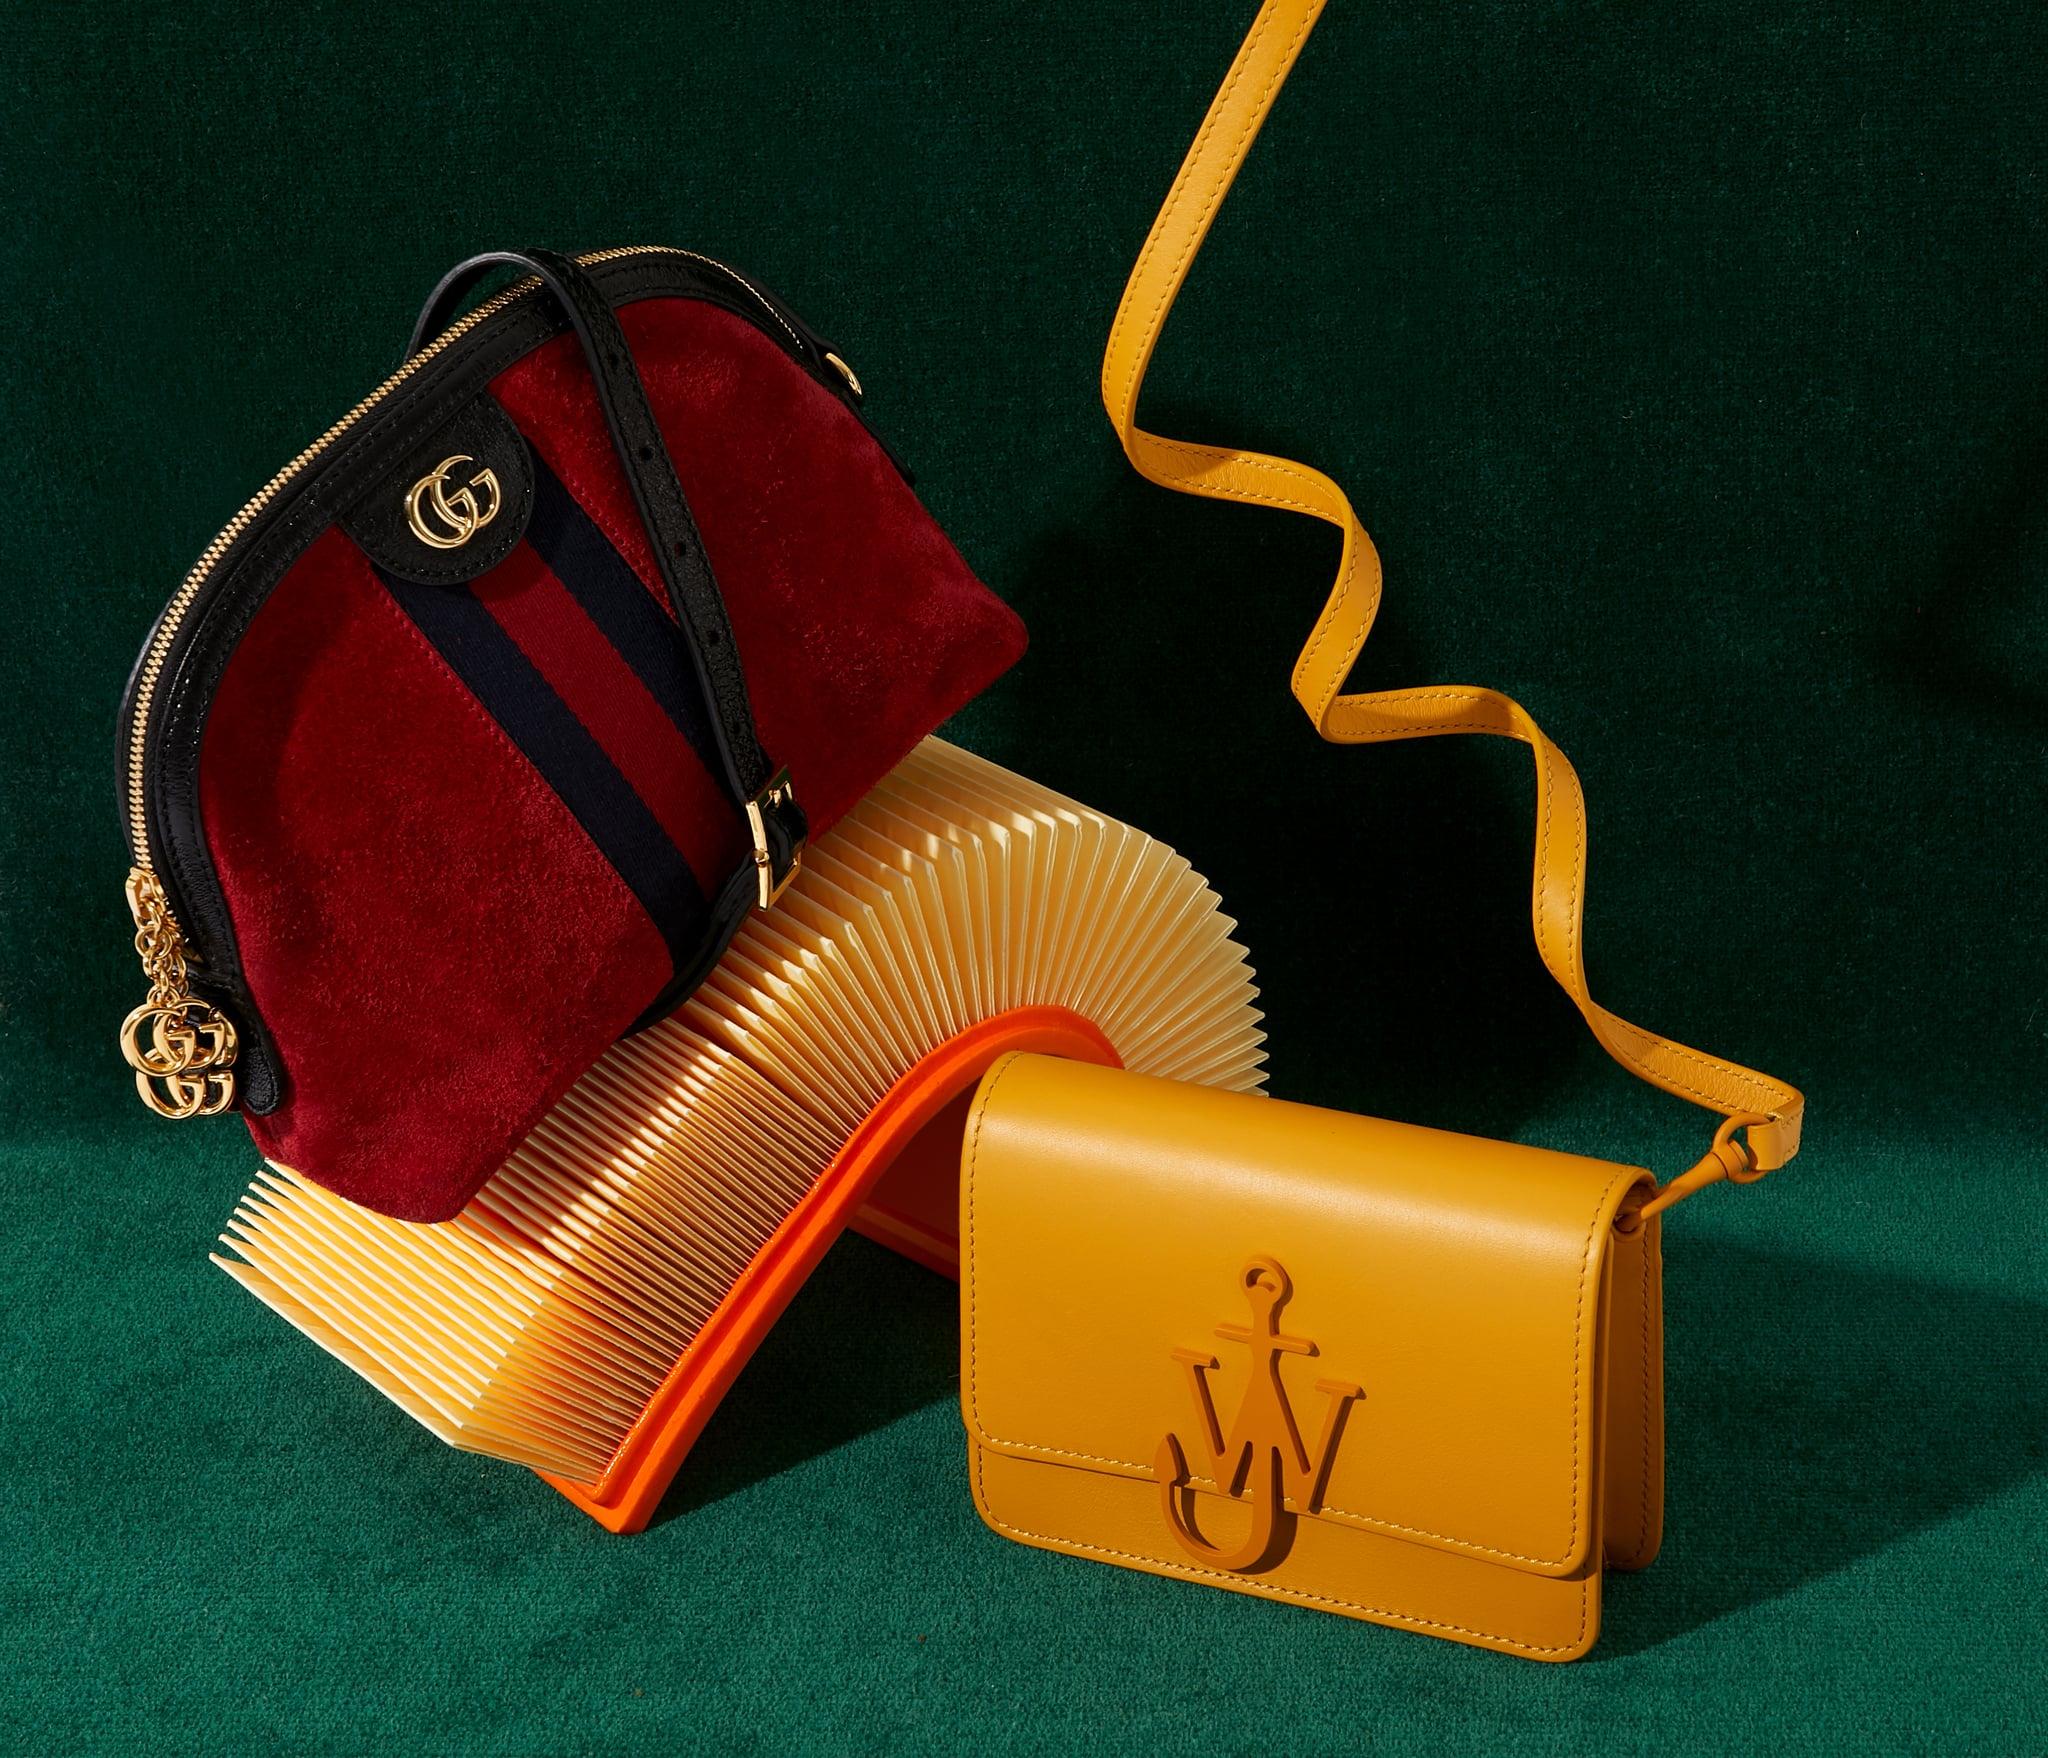 tmp_ooFNgP_1b8bd2cb153c5b06_191017_stilllife-women-hot-designers-bags.jpg